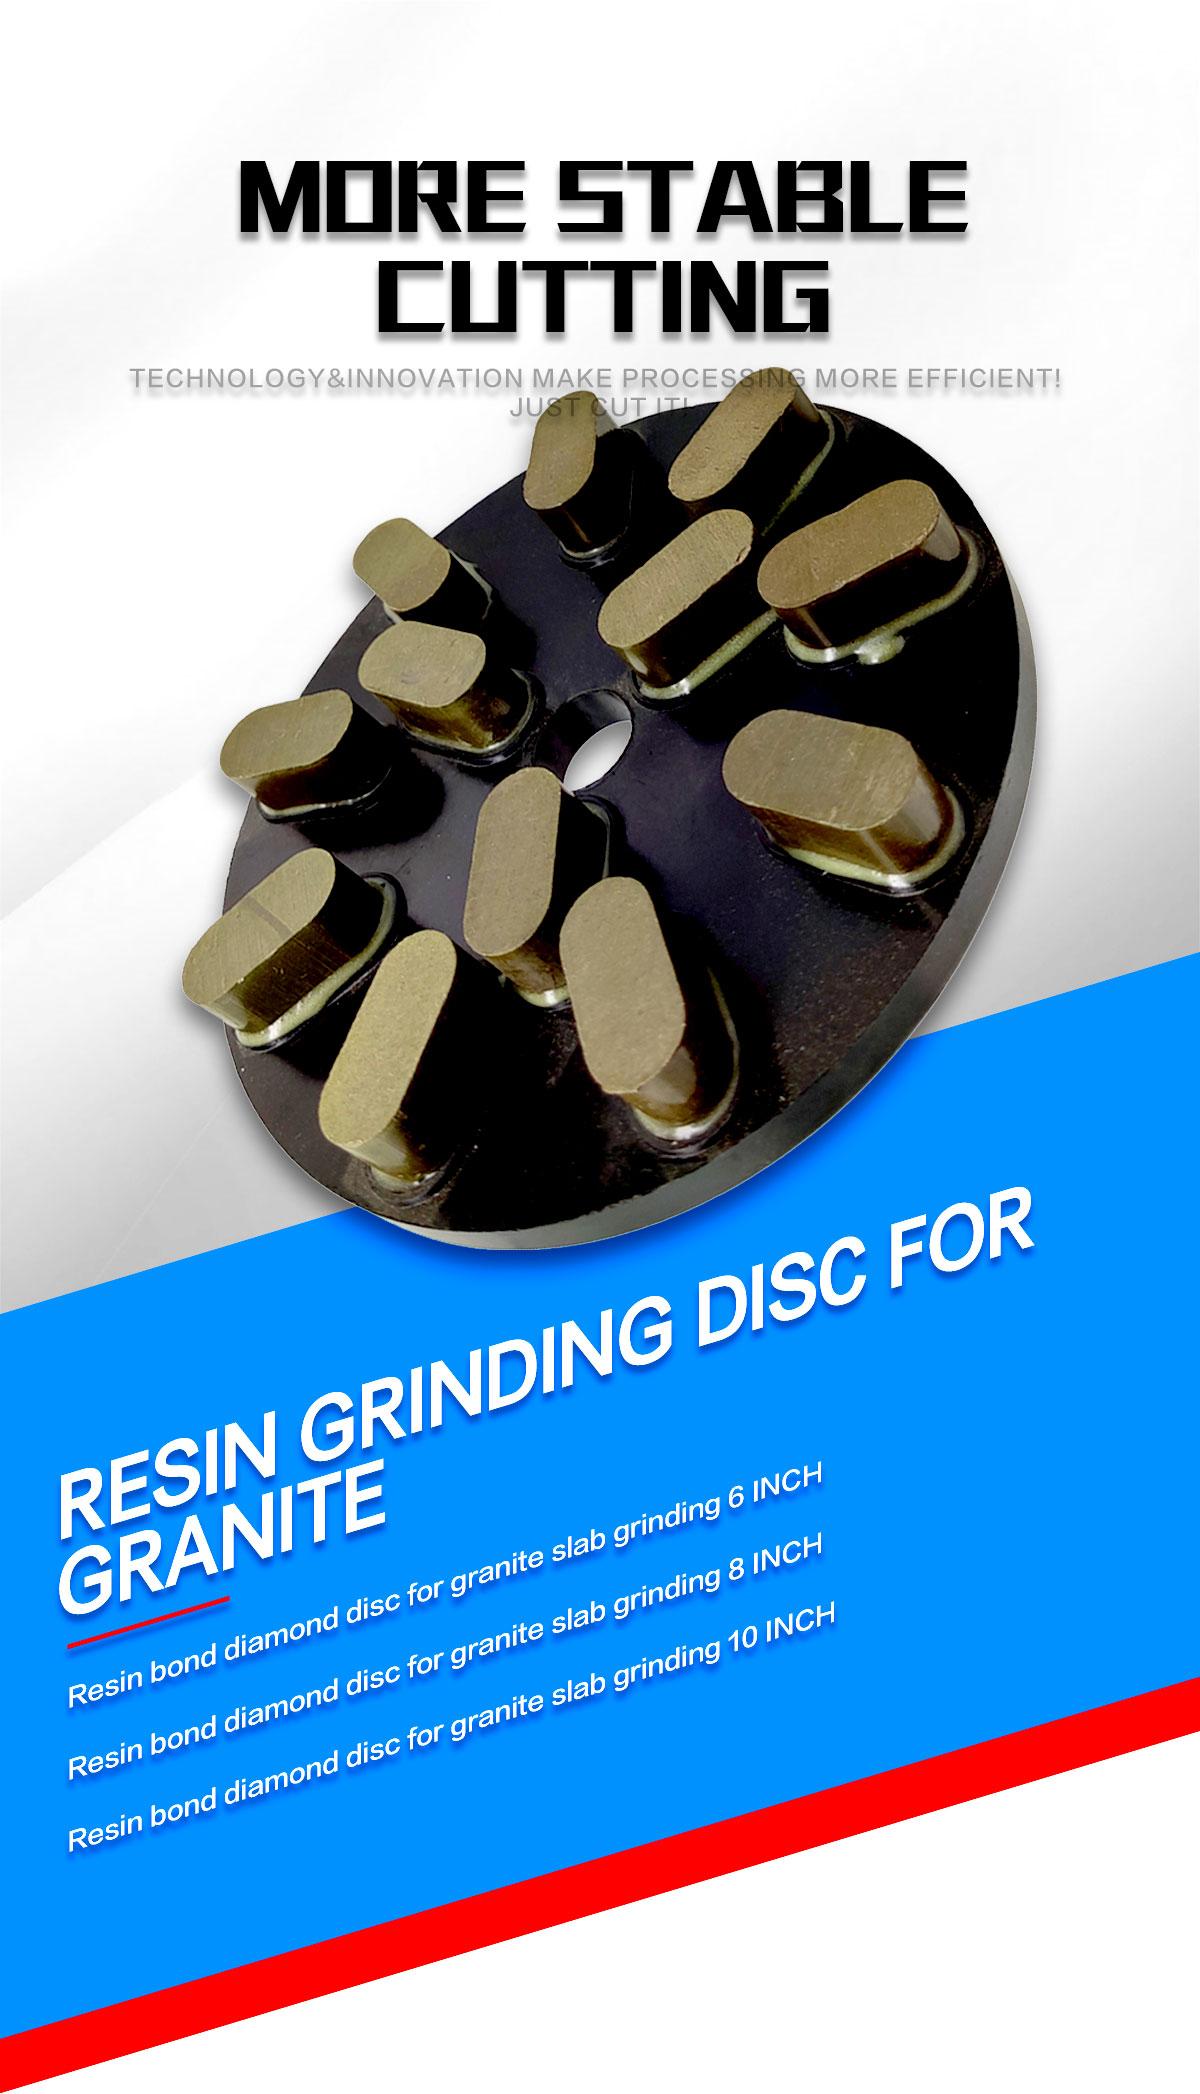 granite slab surface polishing disc